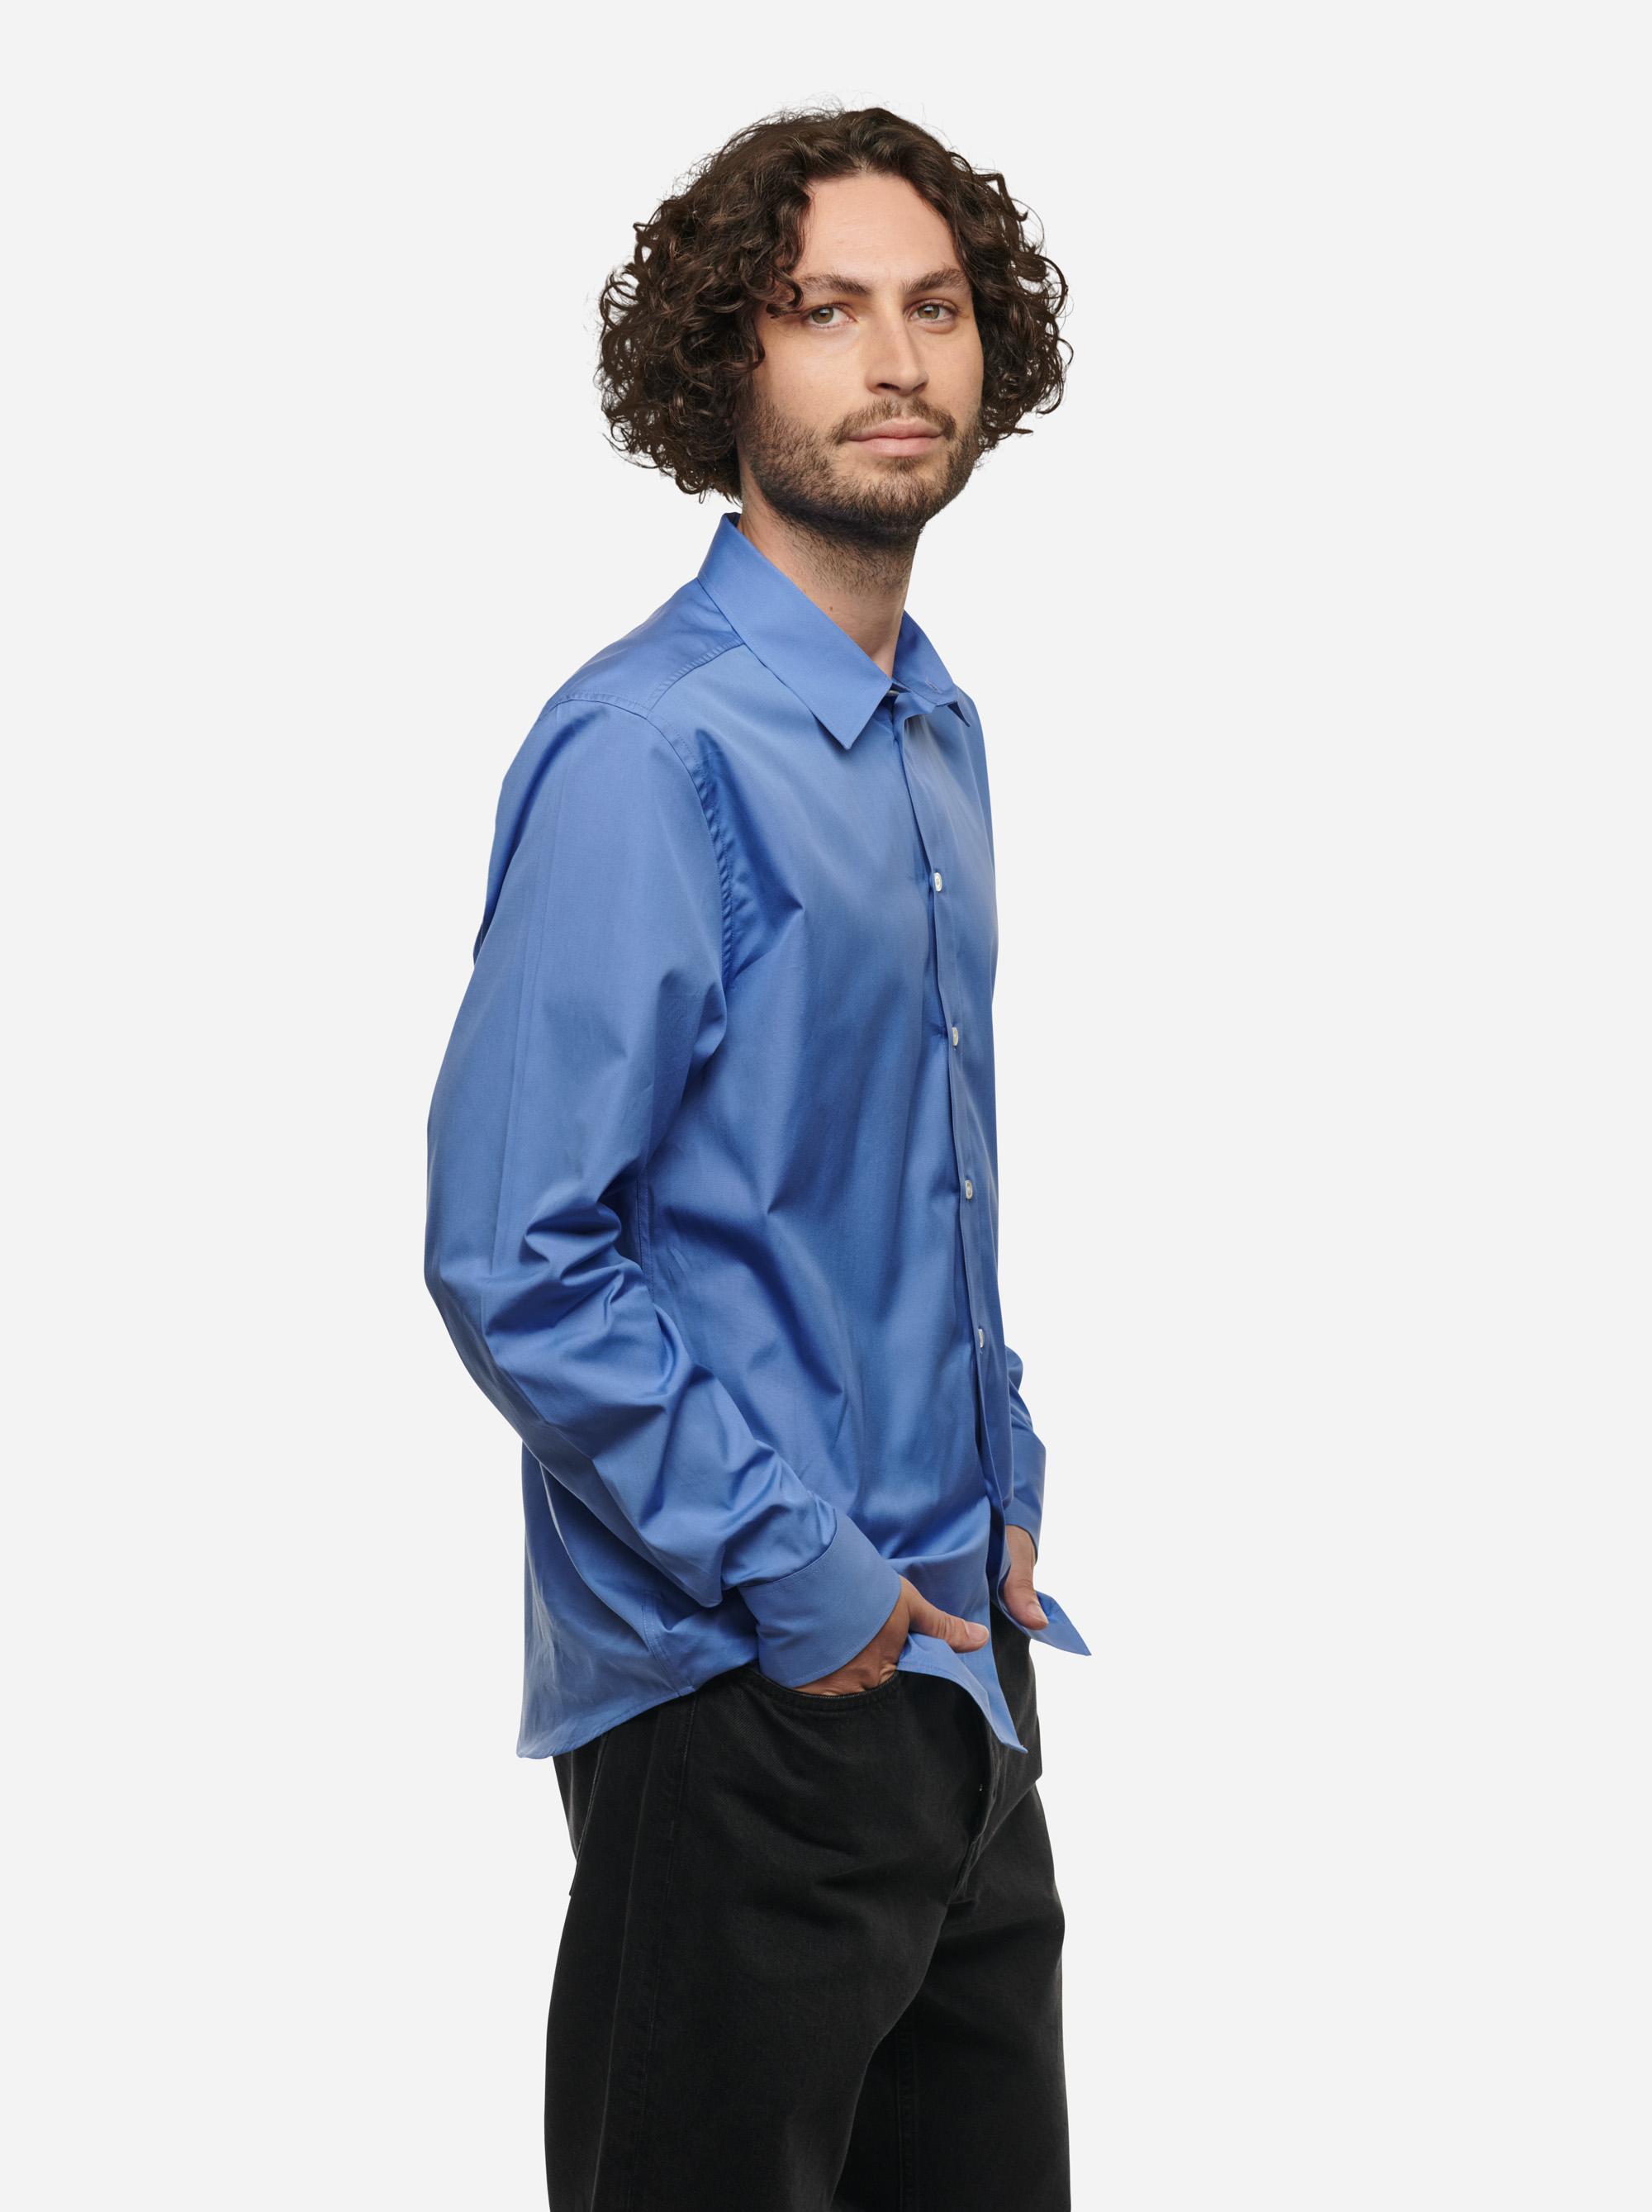 Teym - The Shirt - Men - Blue - 2